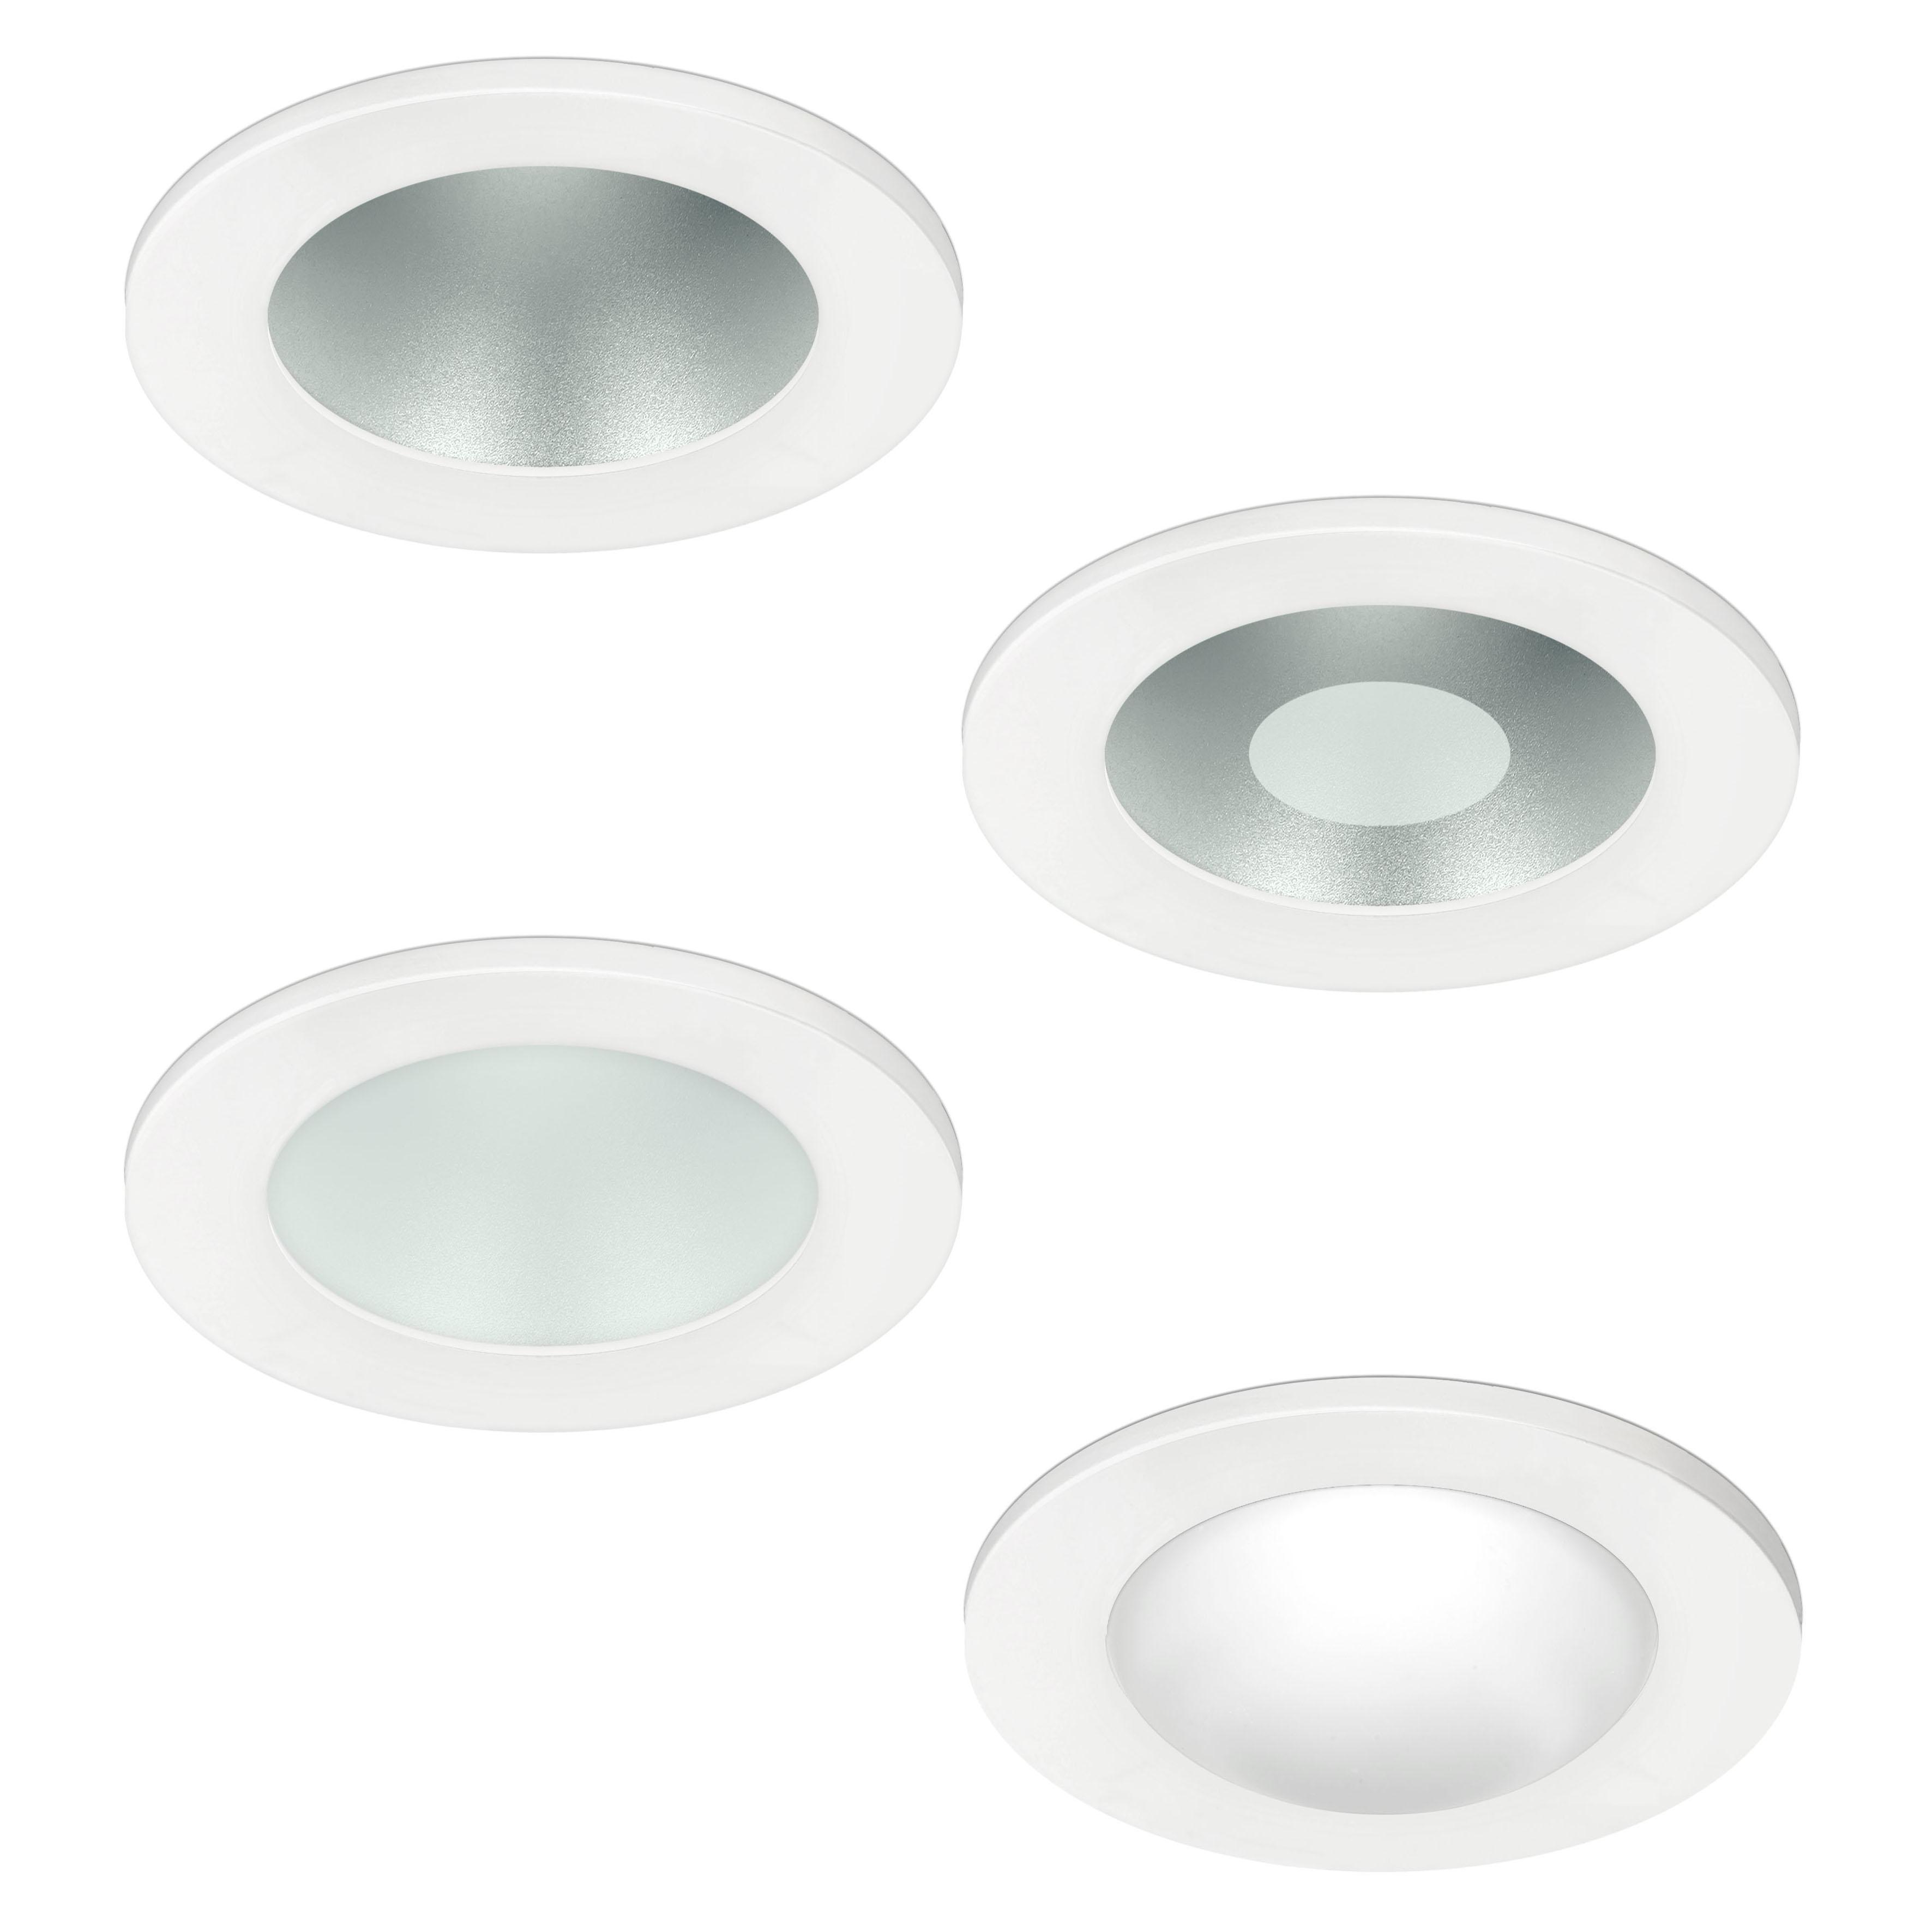 Iris Glass Attachment Options